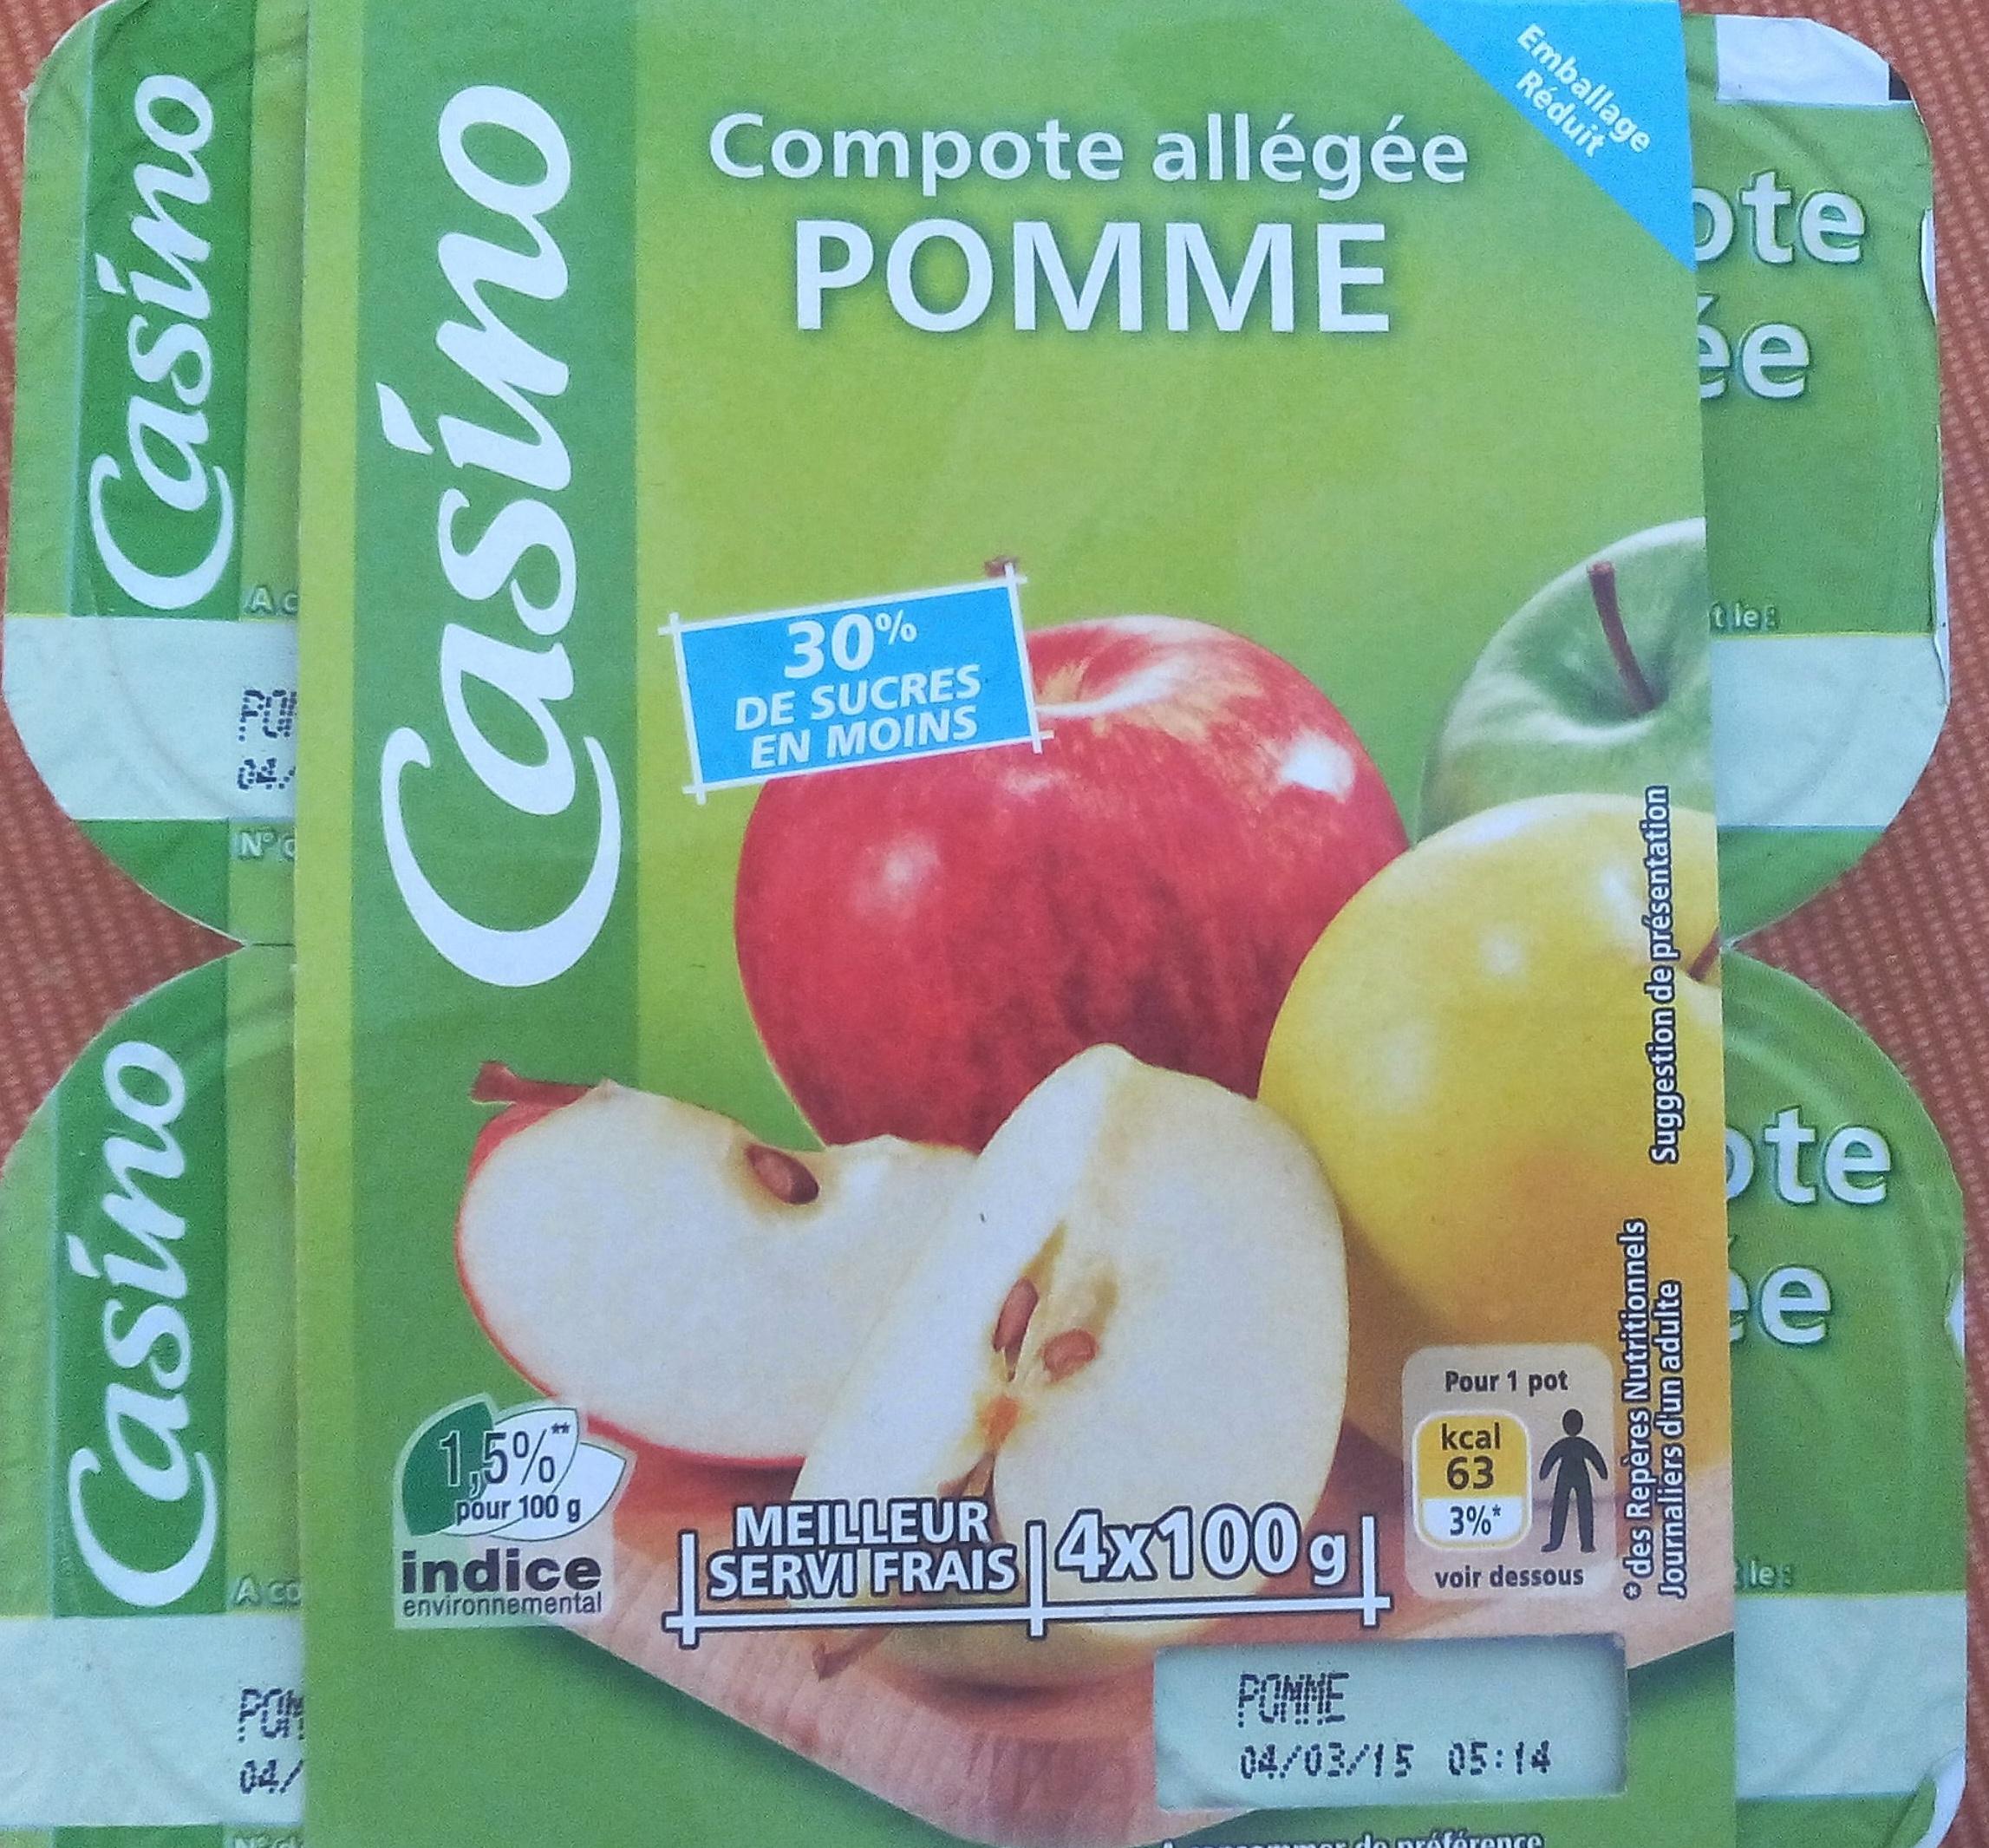 Compote Allégée Pommes - Produkt